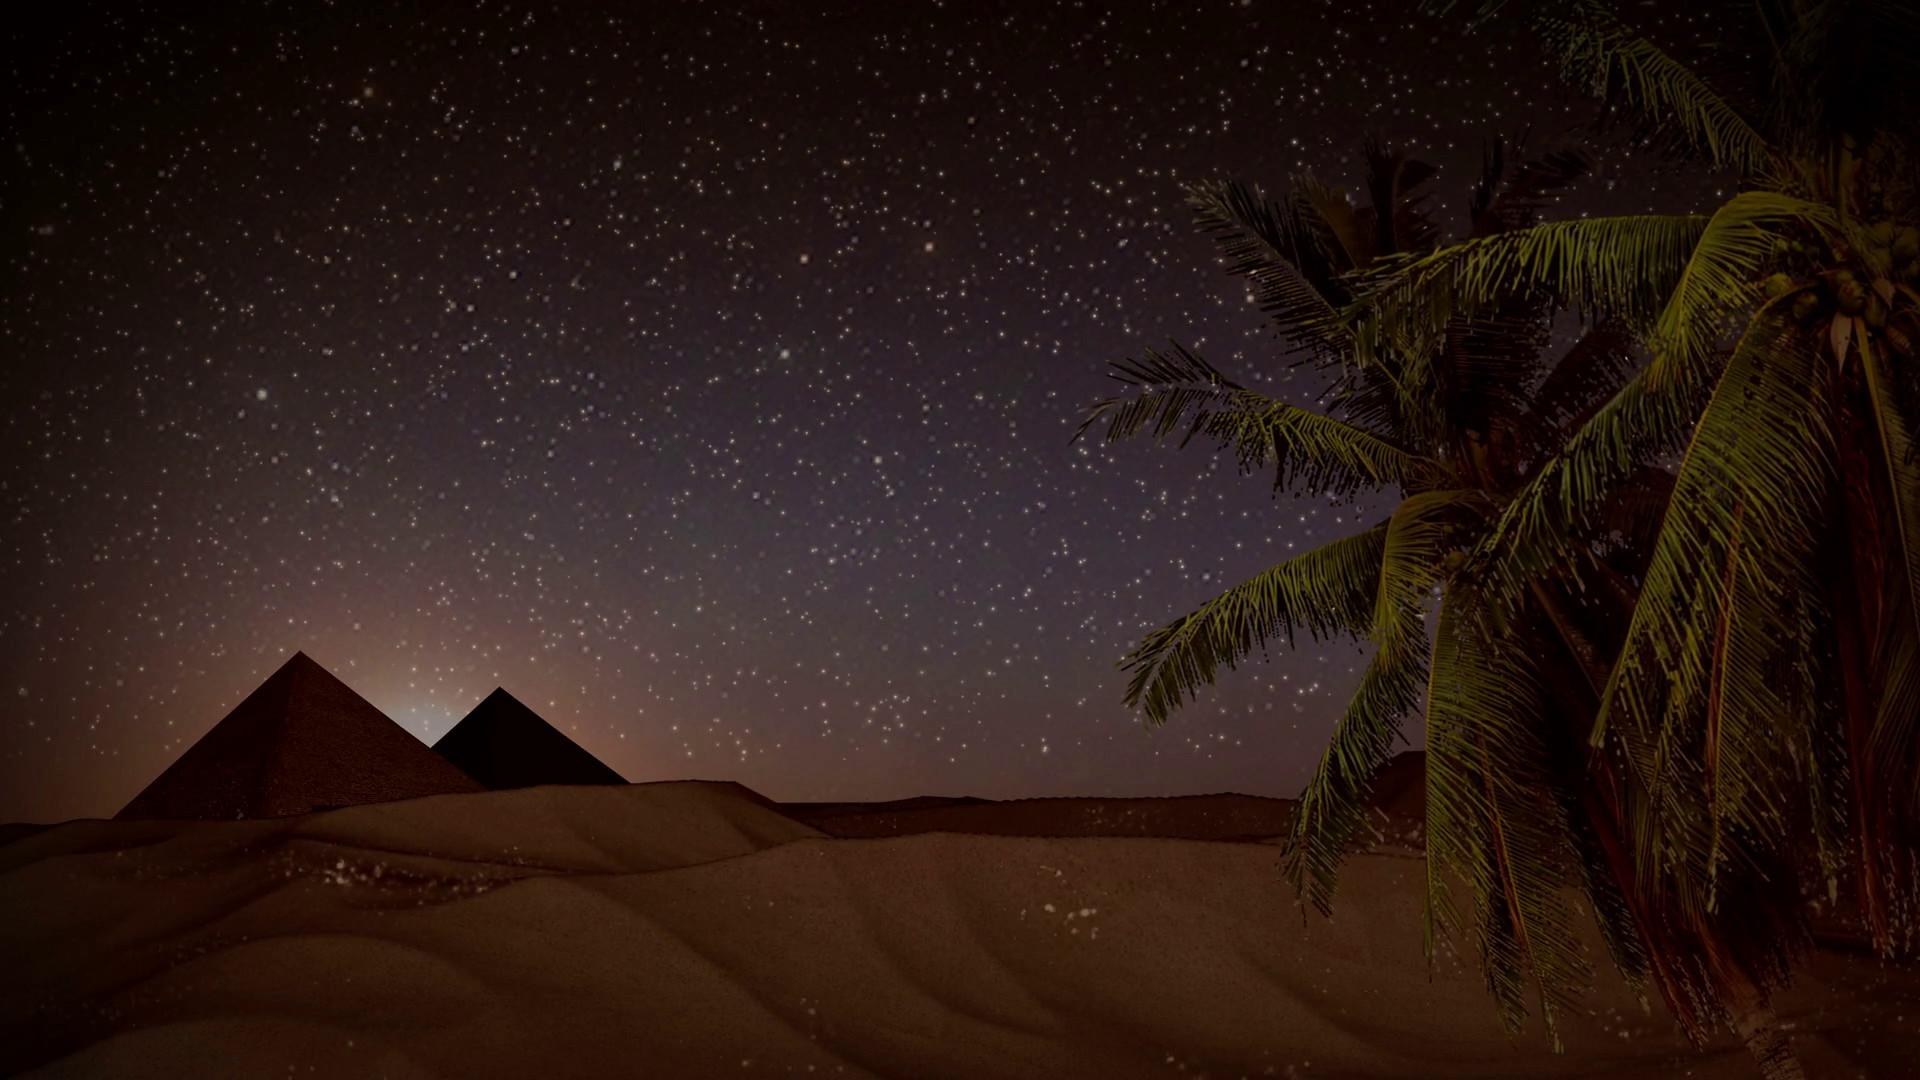 Free Animated Desktop Wallpaper Like Snow Falling On Background Desert Background 58 Images